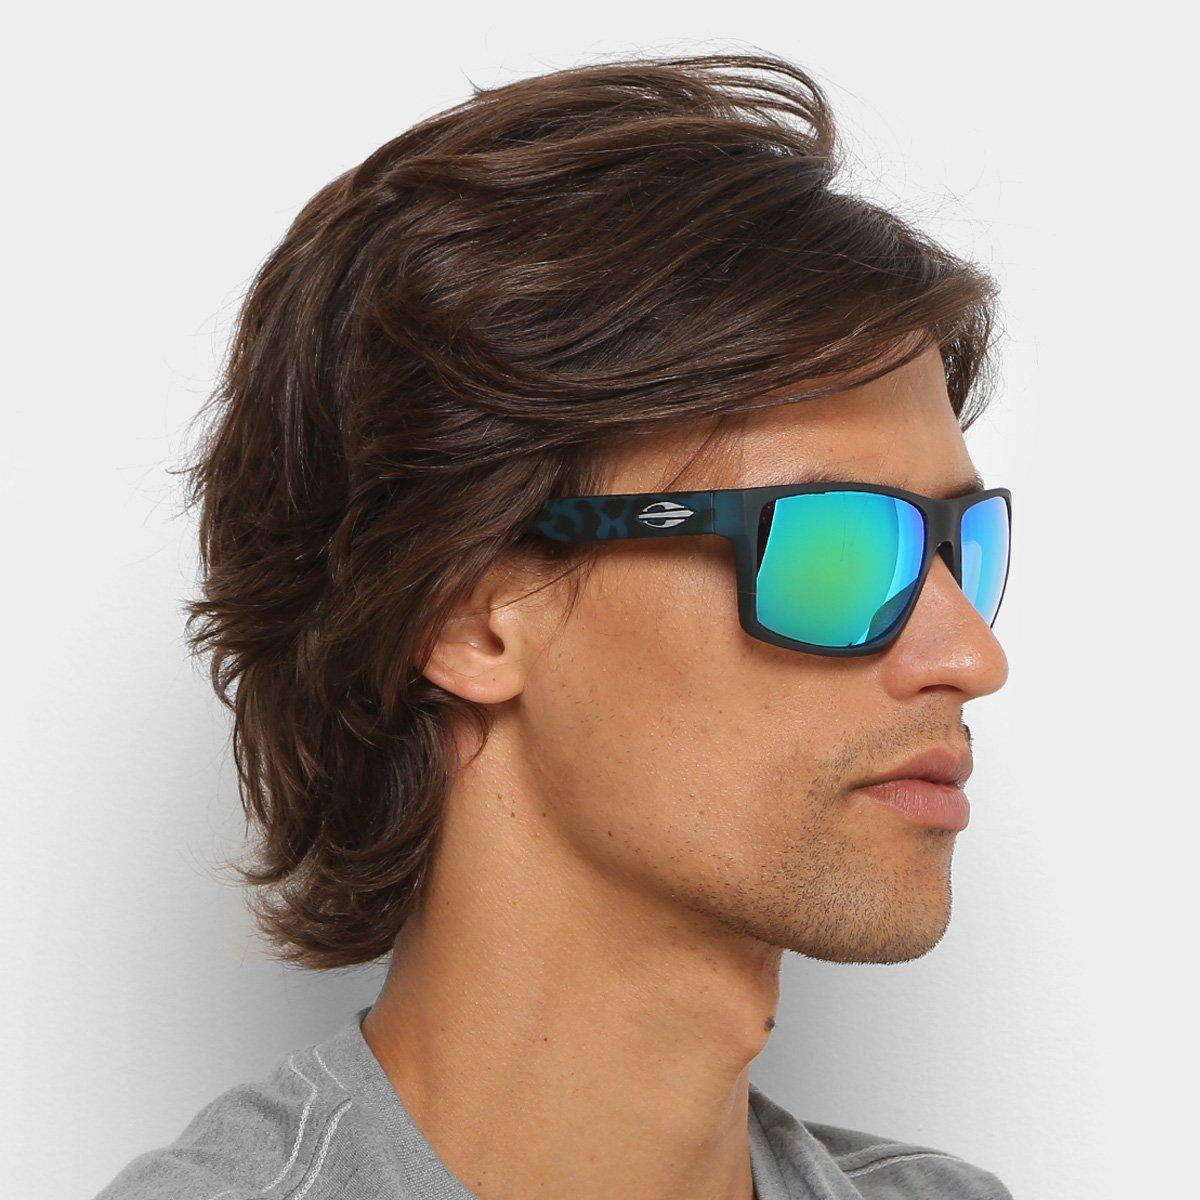 e1f21170a94ef Óculos de Sol Mormaii Carmel Fosco Camuflado Masculino